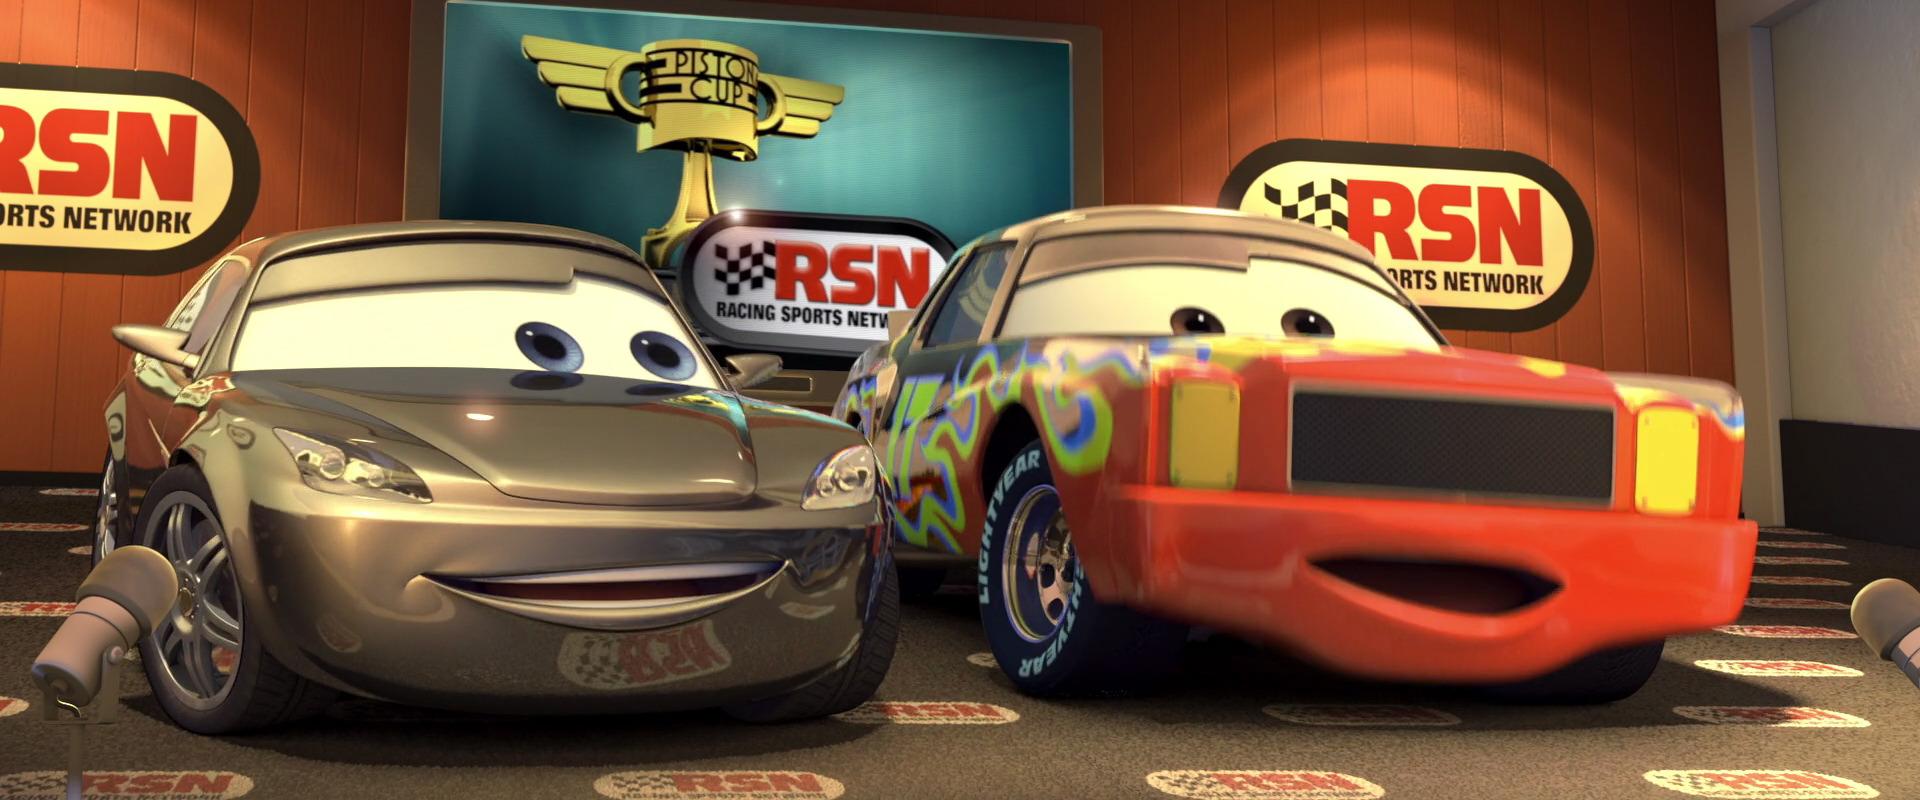 bob-culasse-personnage-cars-02